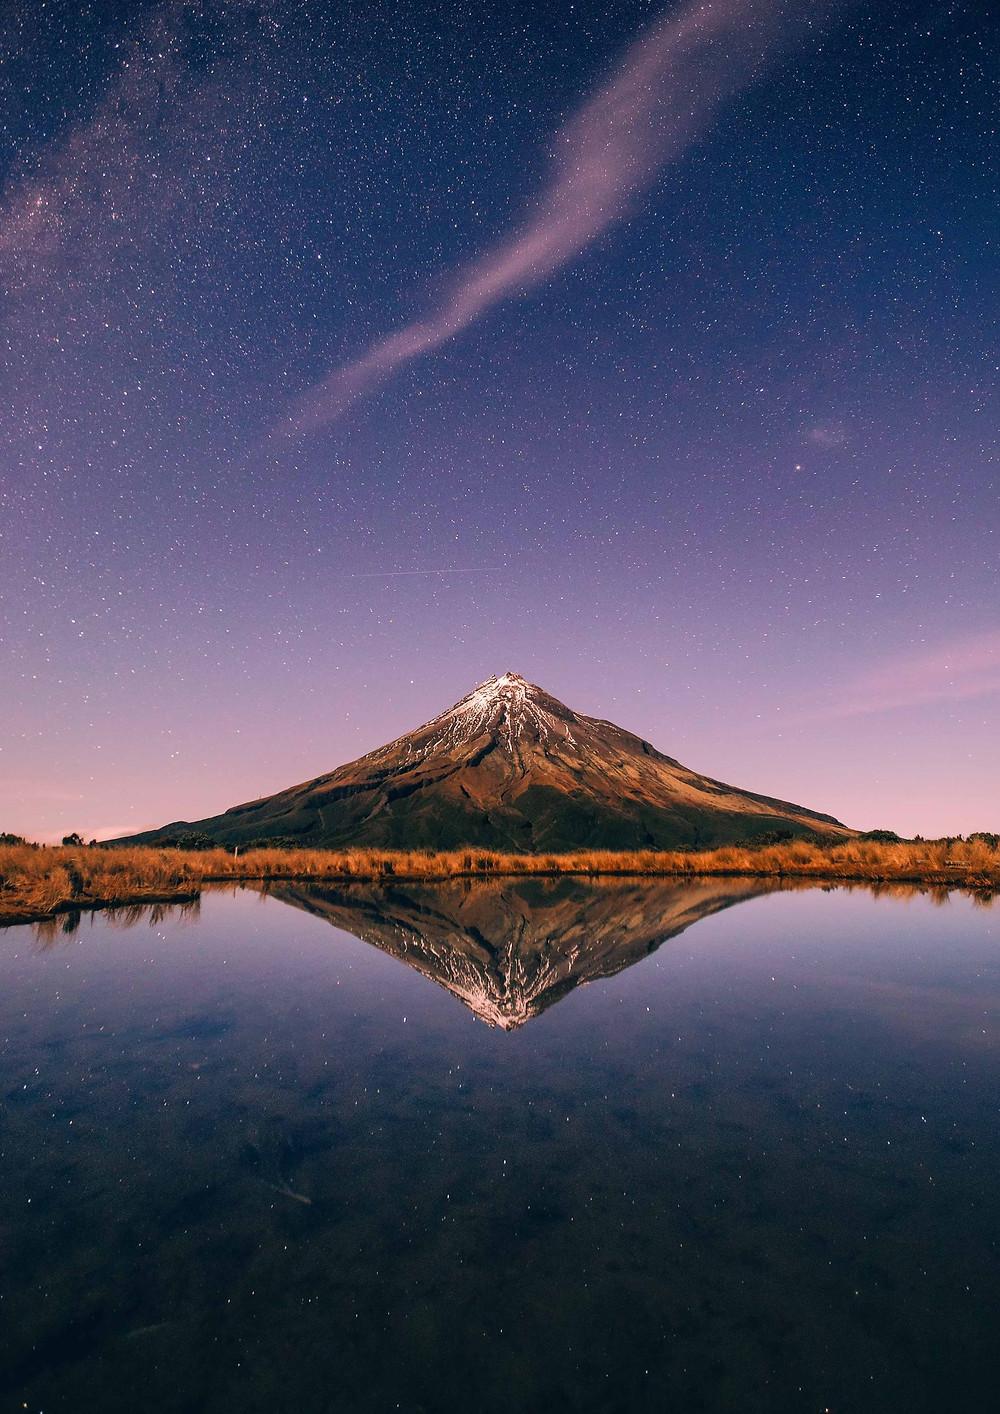 Mount Taranaki astrophotography